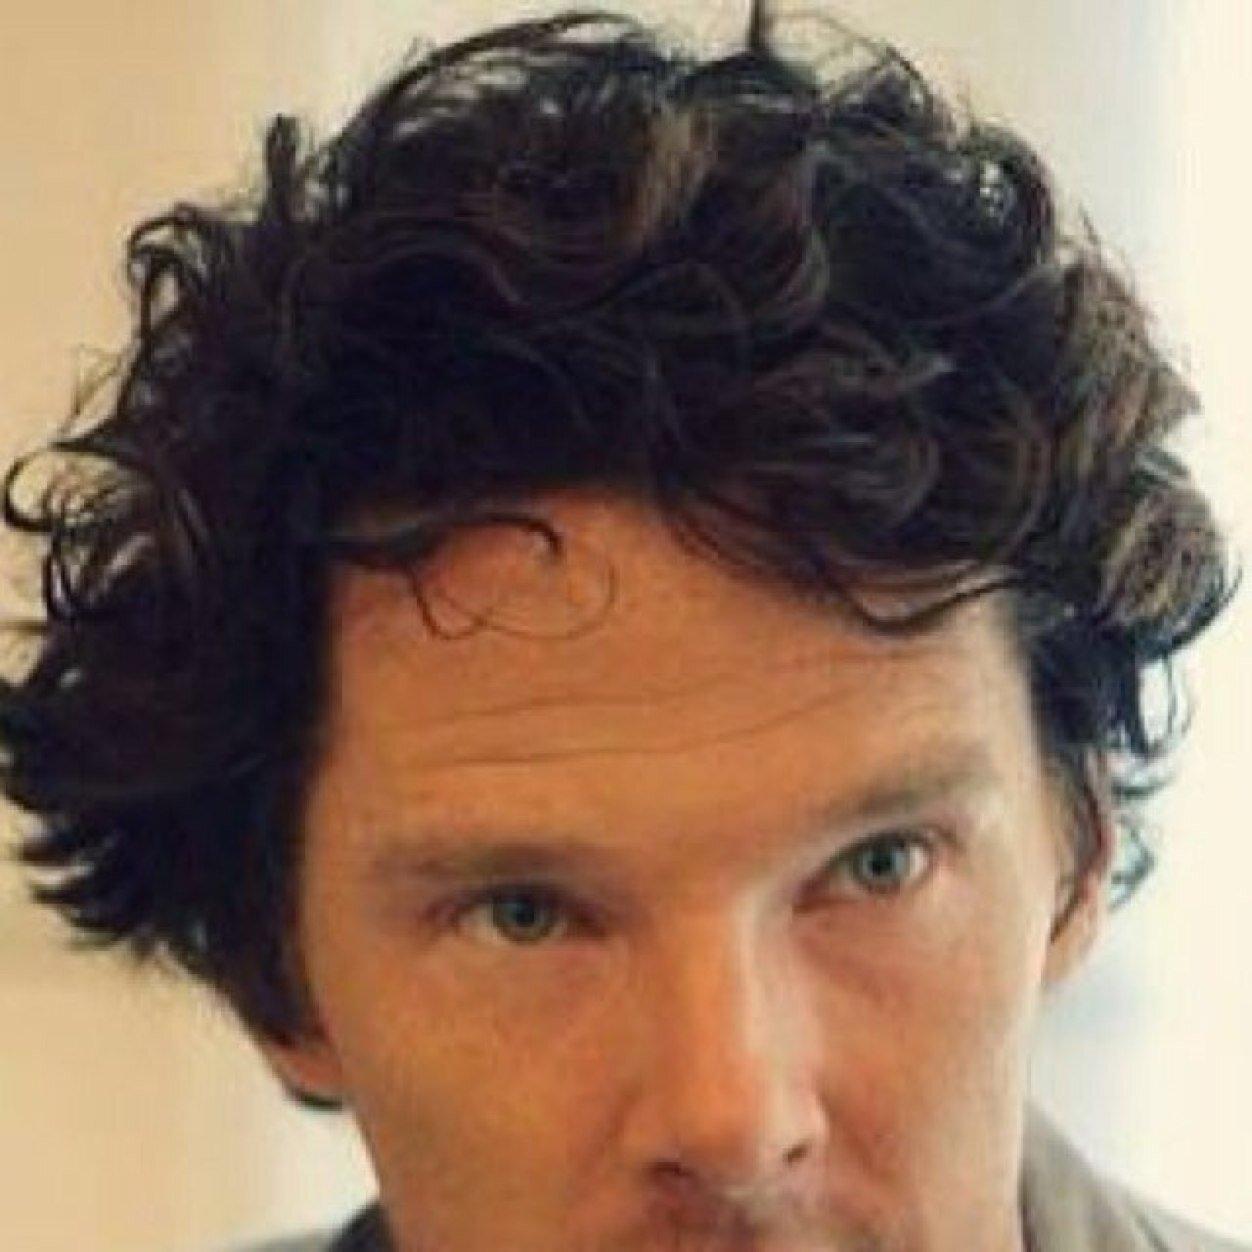 Sherlock's Hair (OR) (@sherlockhair67) | Twitter